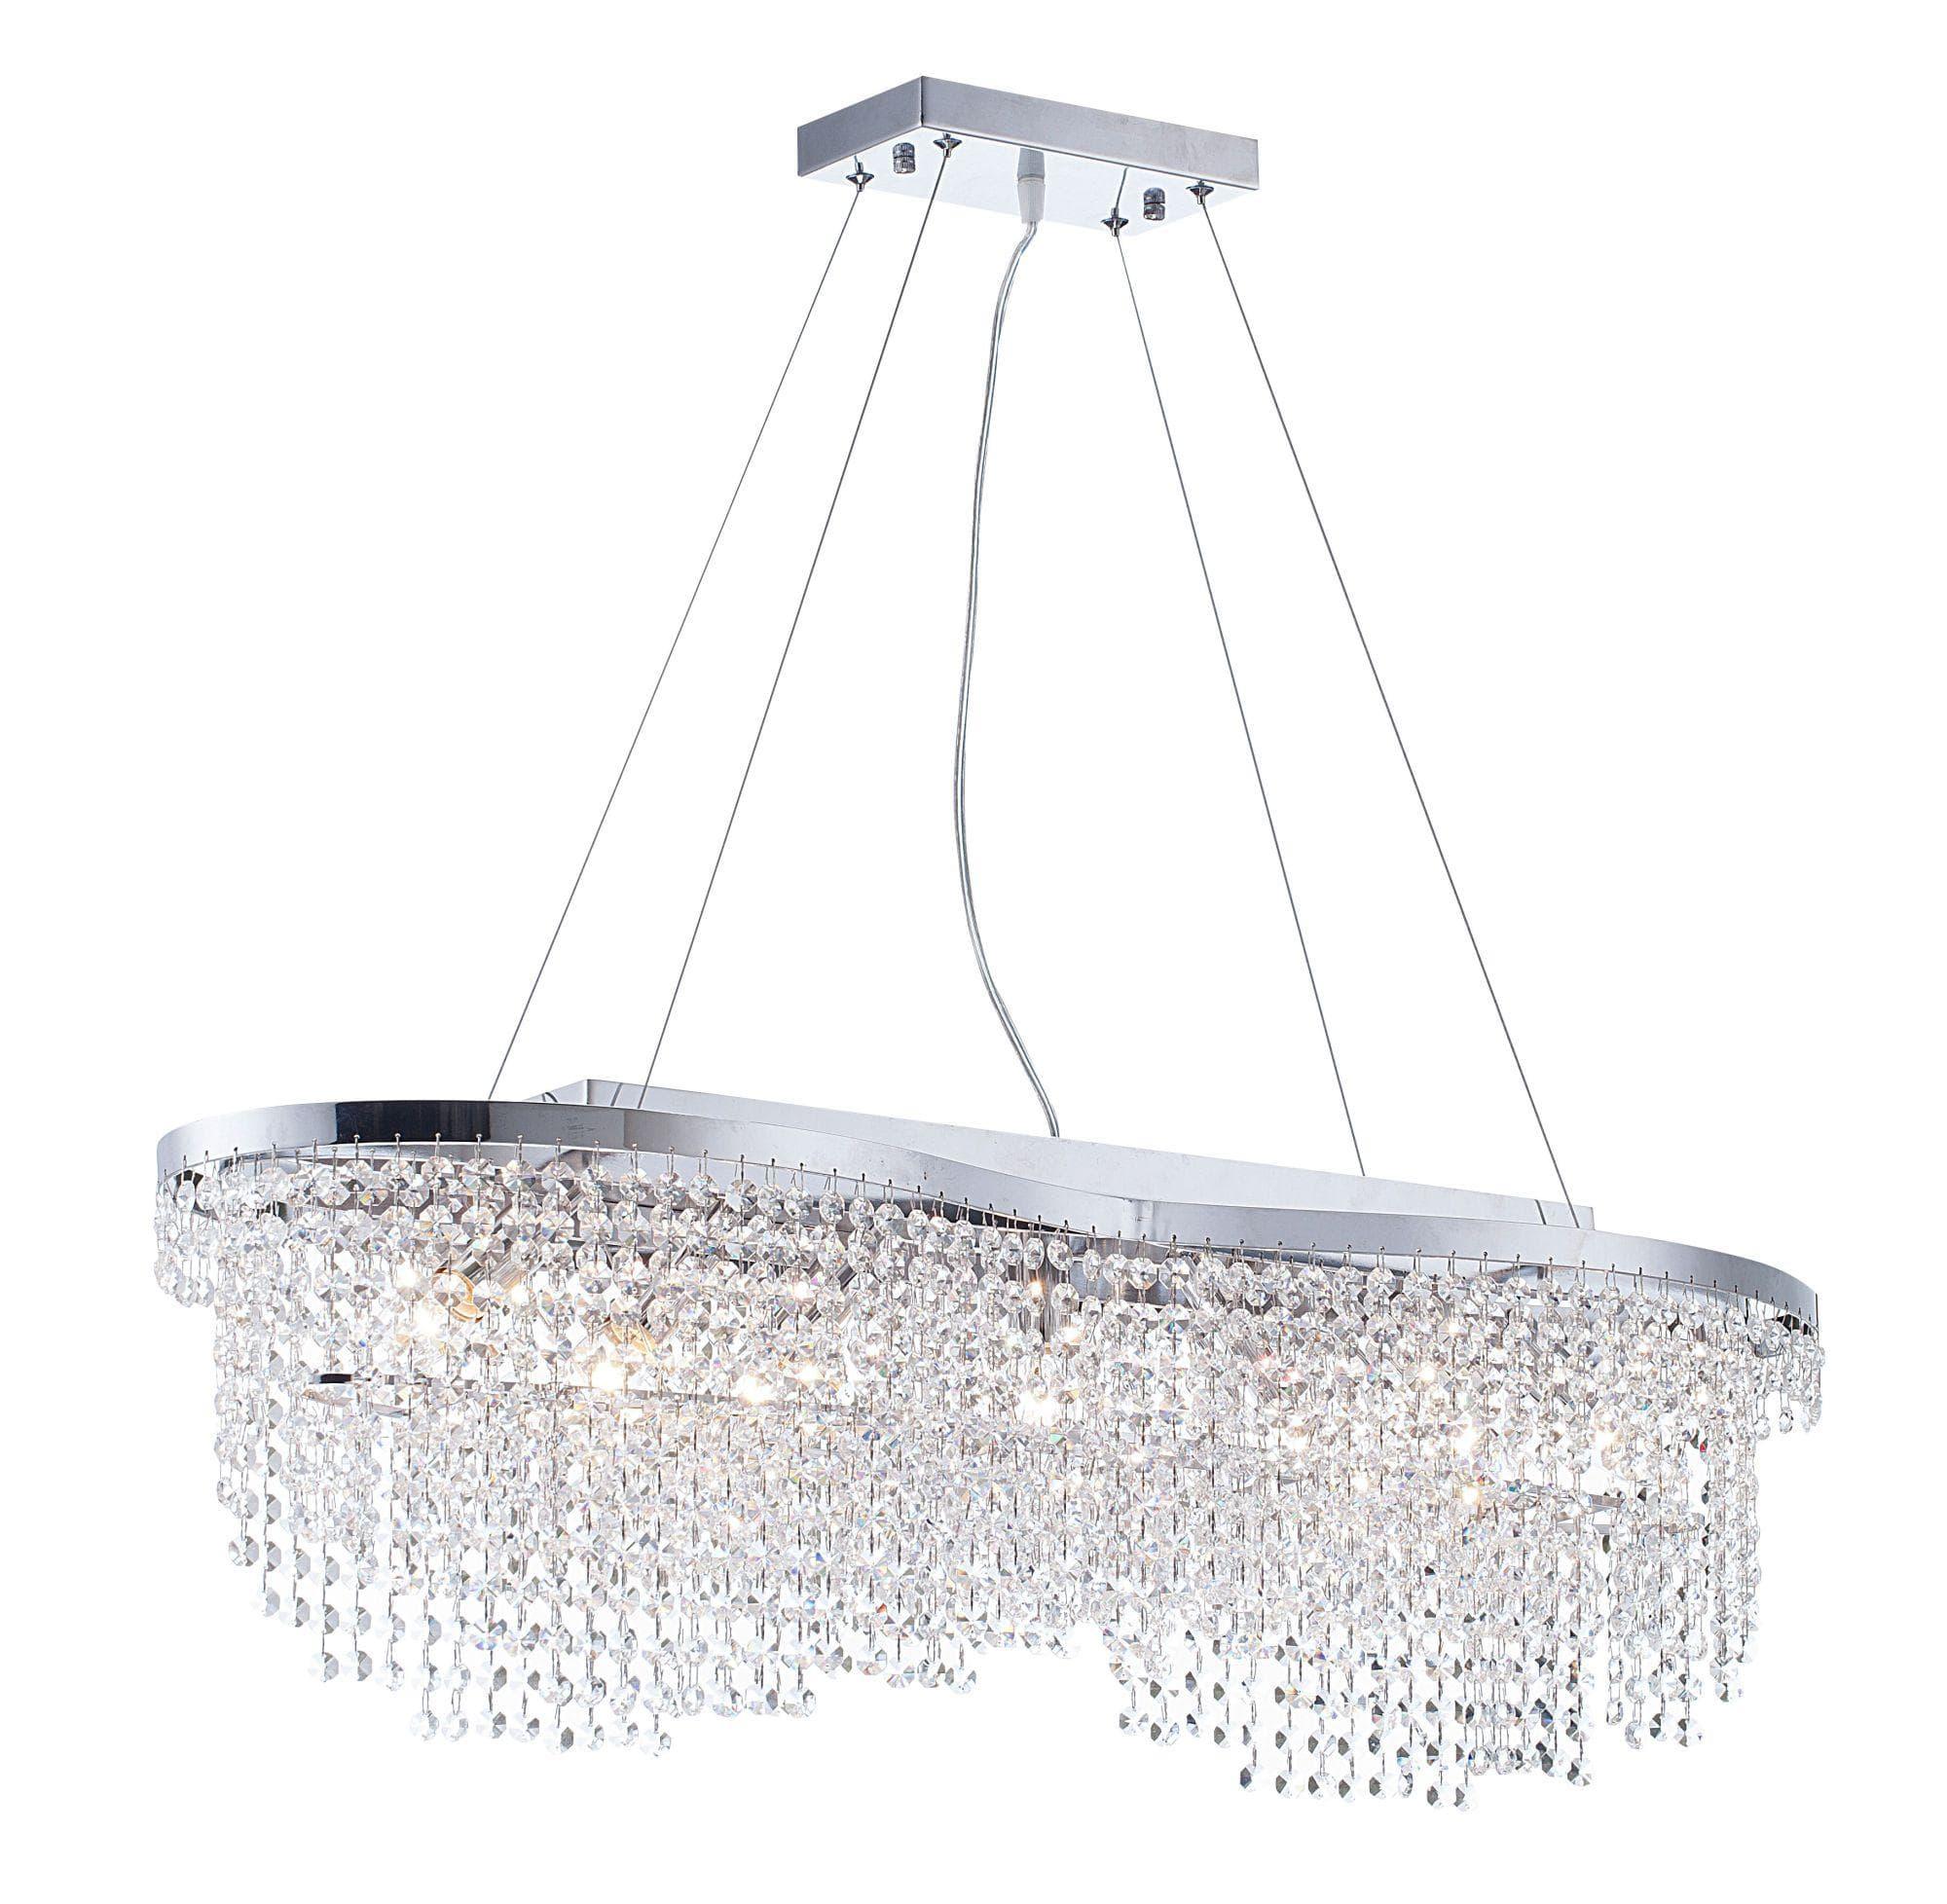 Lampa wisząca Tois - Maytoni - srebrna, kryształki